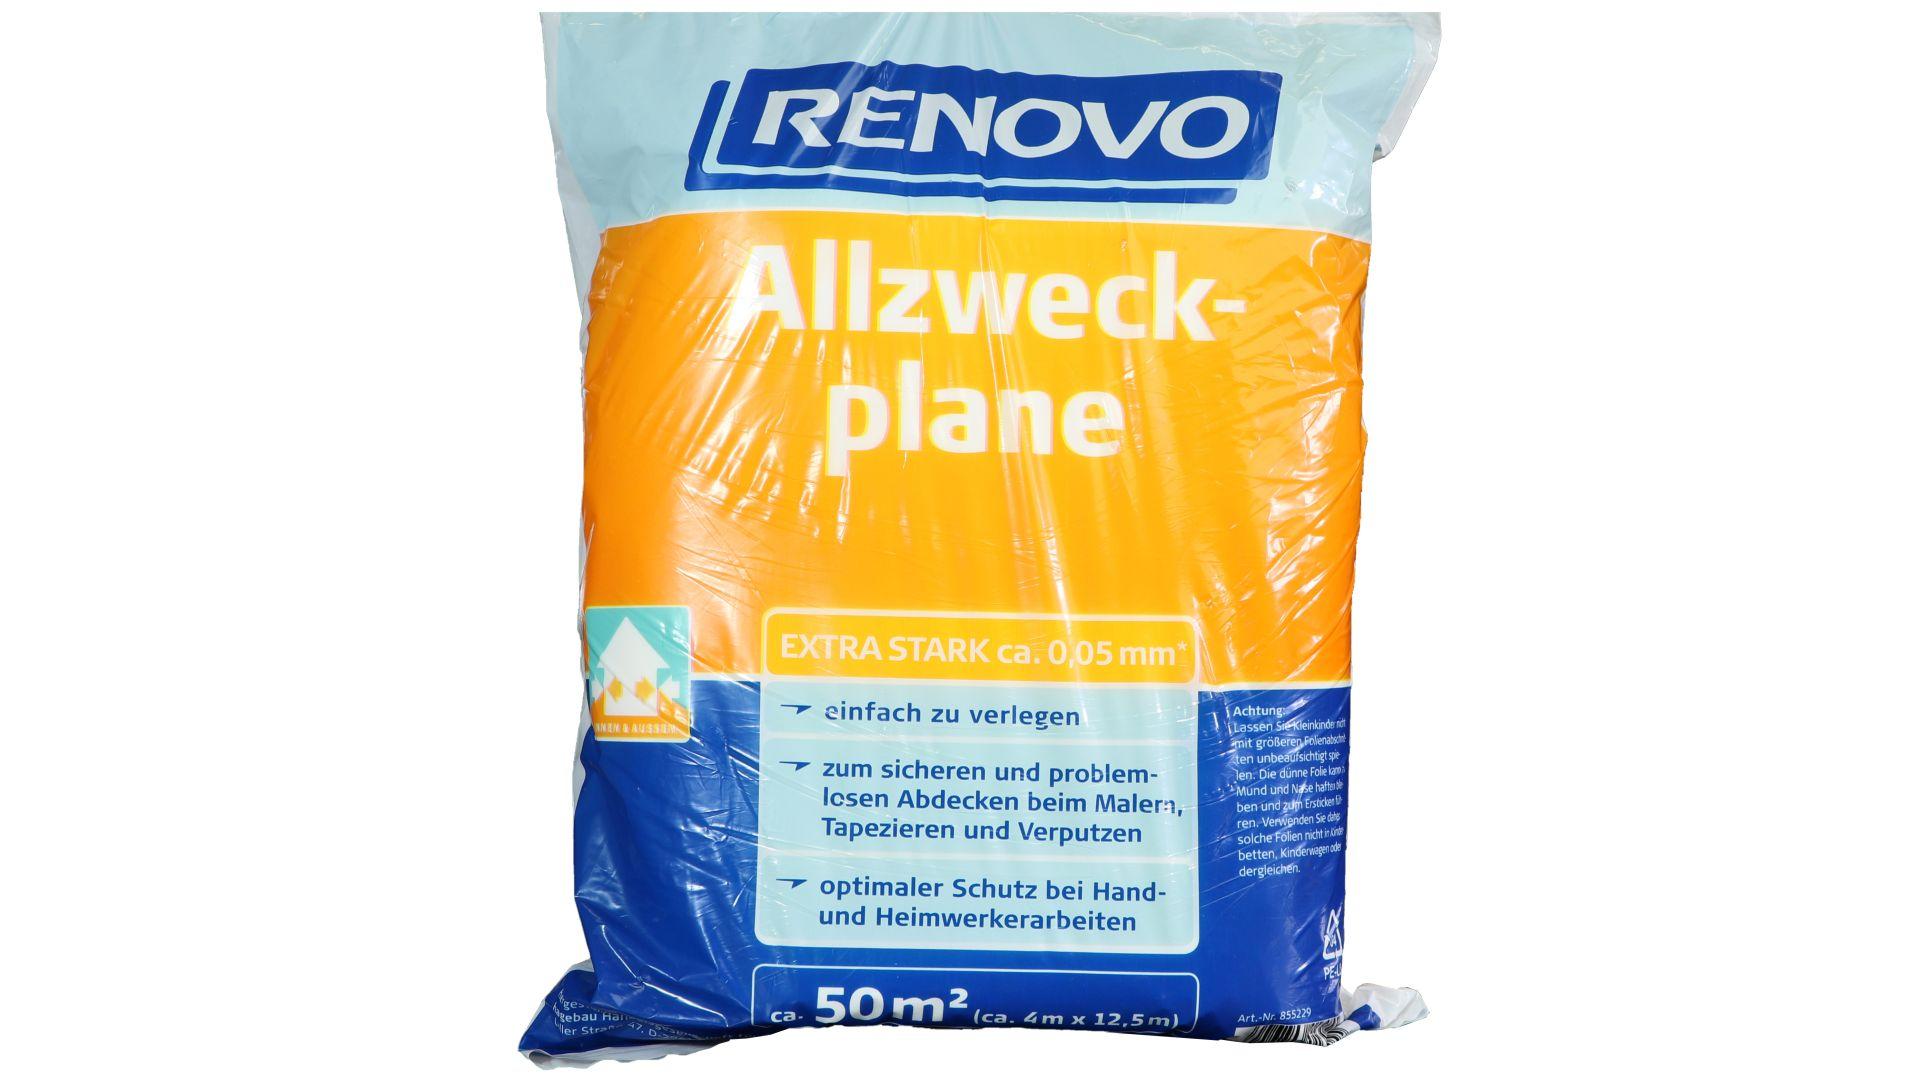 RENOVO Allzweckplane, 12,5 x 4 m x 50 µm